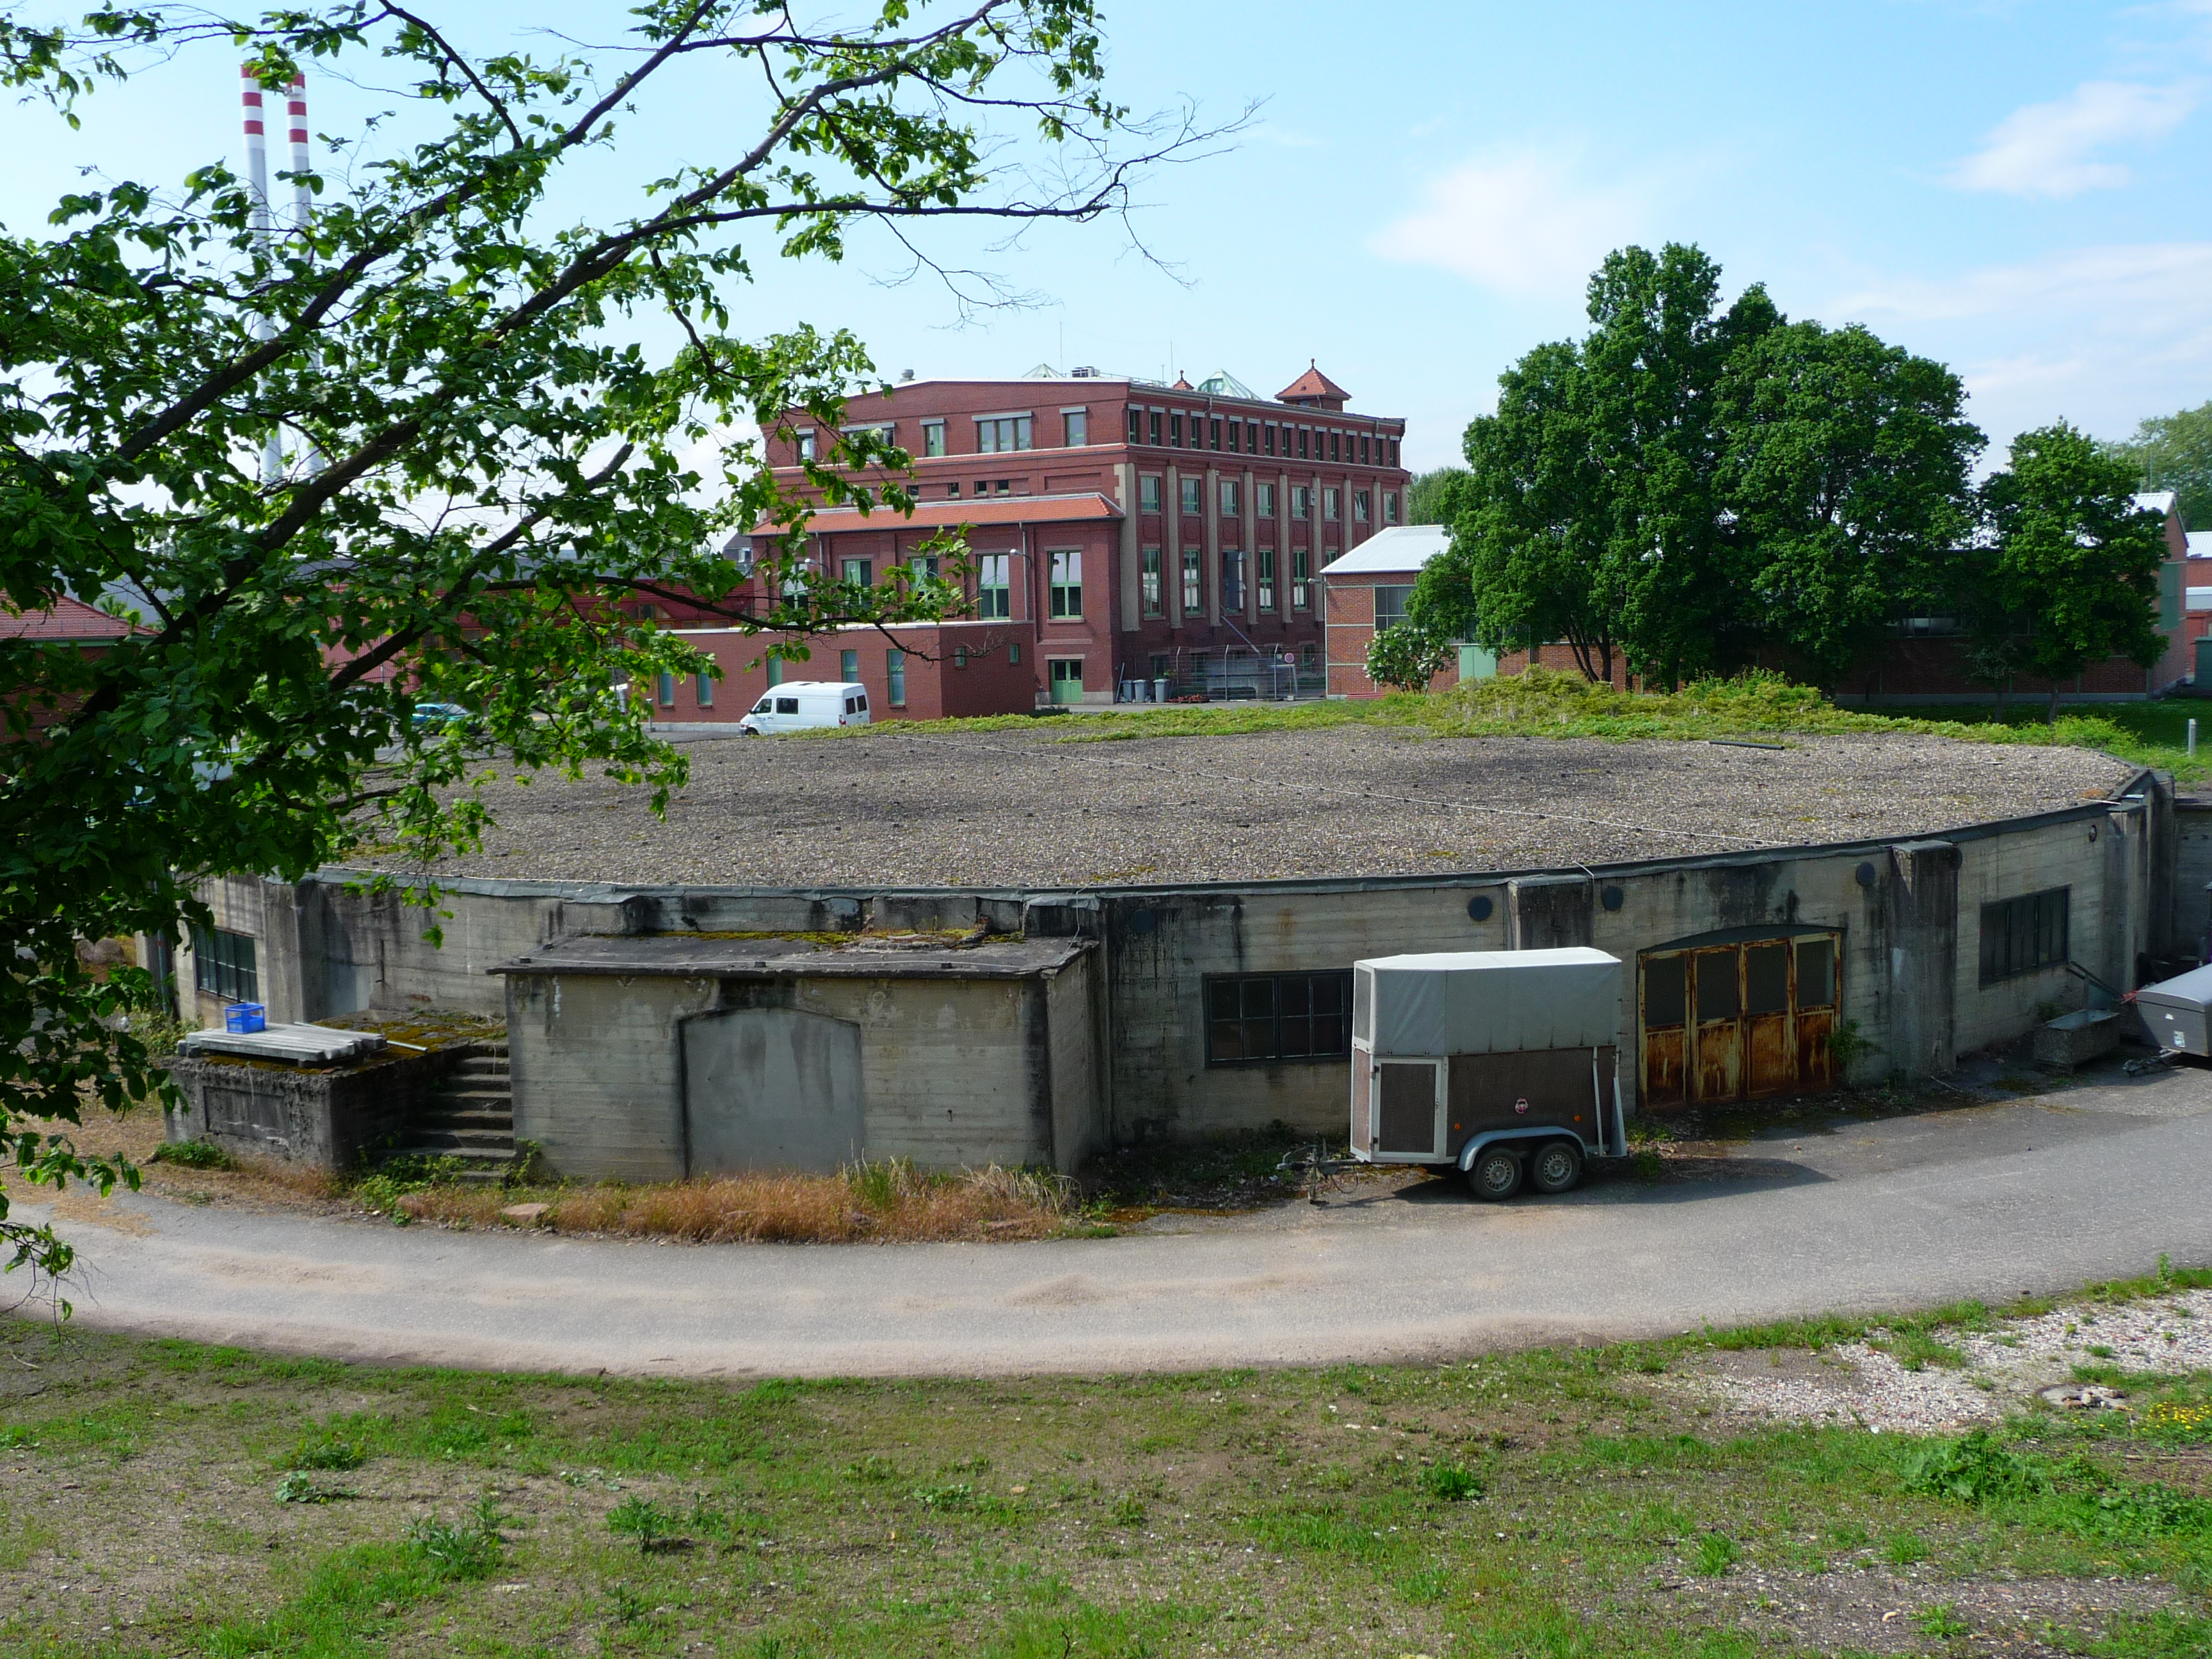 File:Fundament Gaskessel Pfaffengrund.JPG - Wikimedia Commons